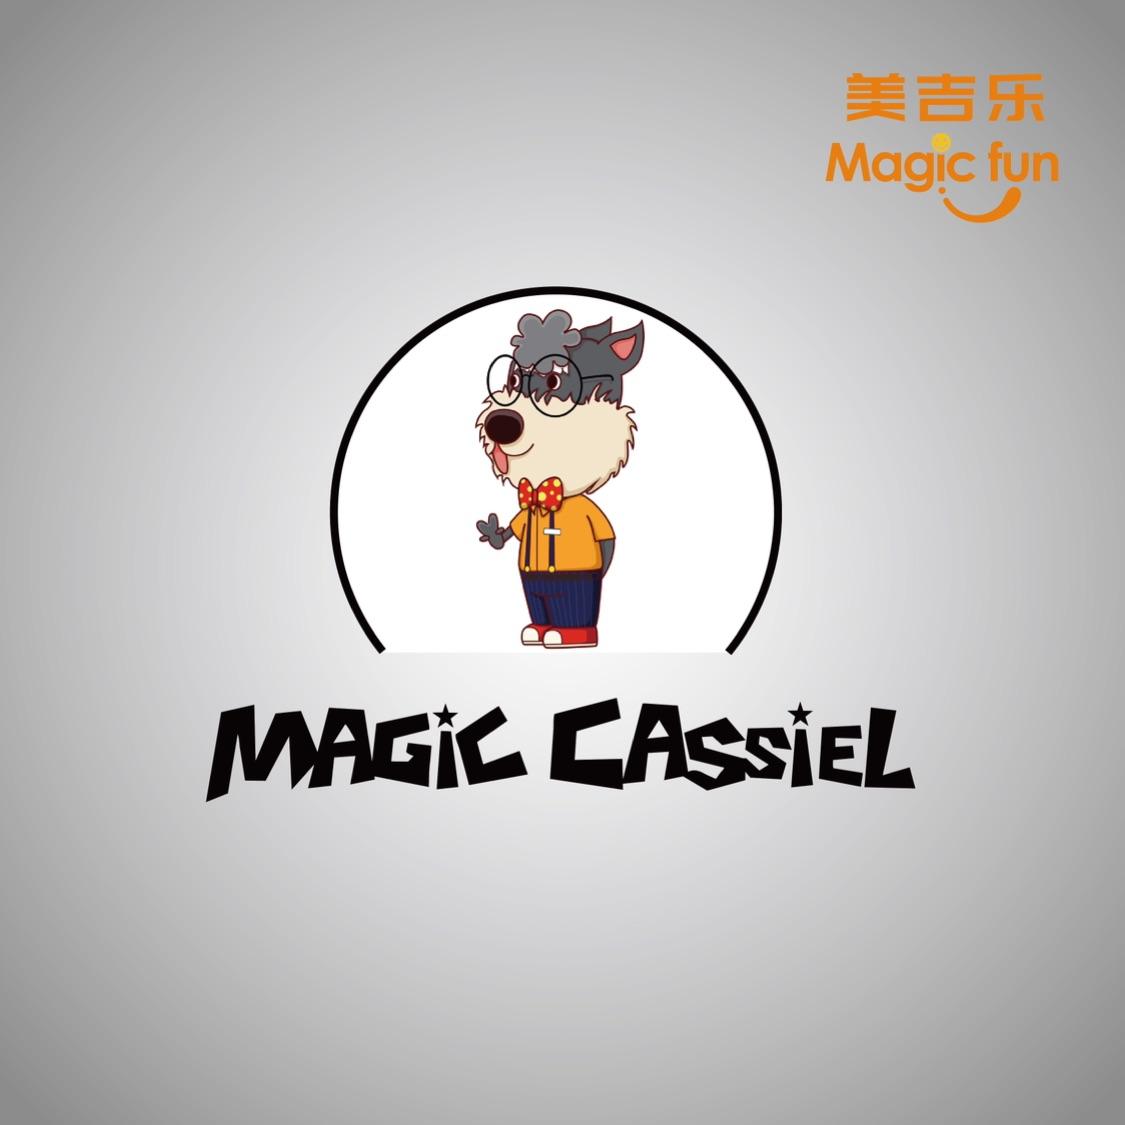 Magic cassiel